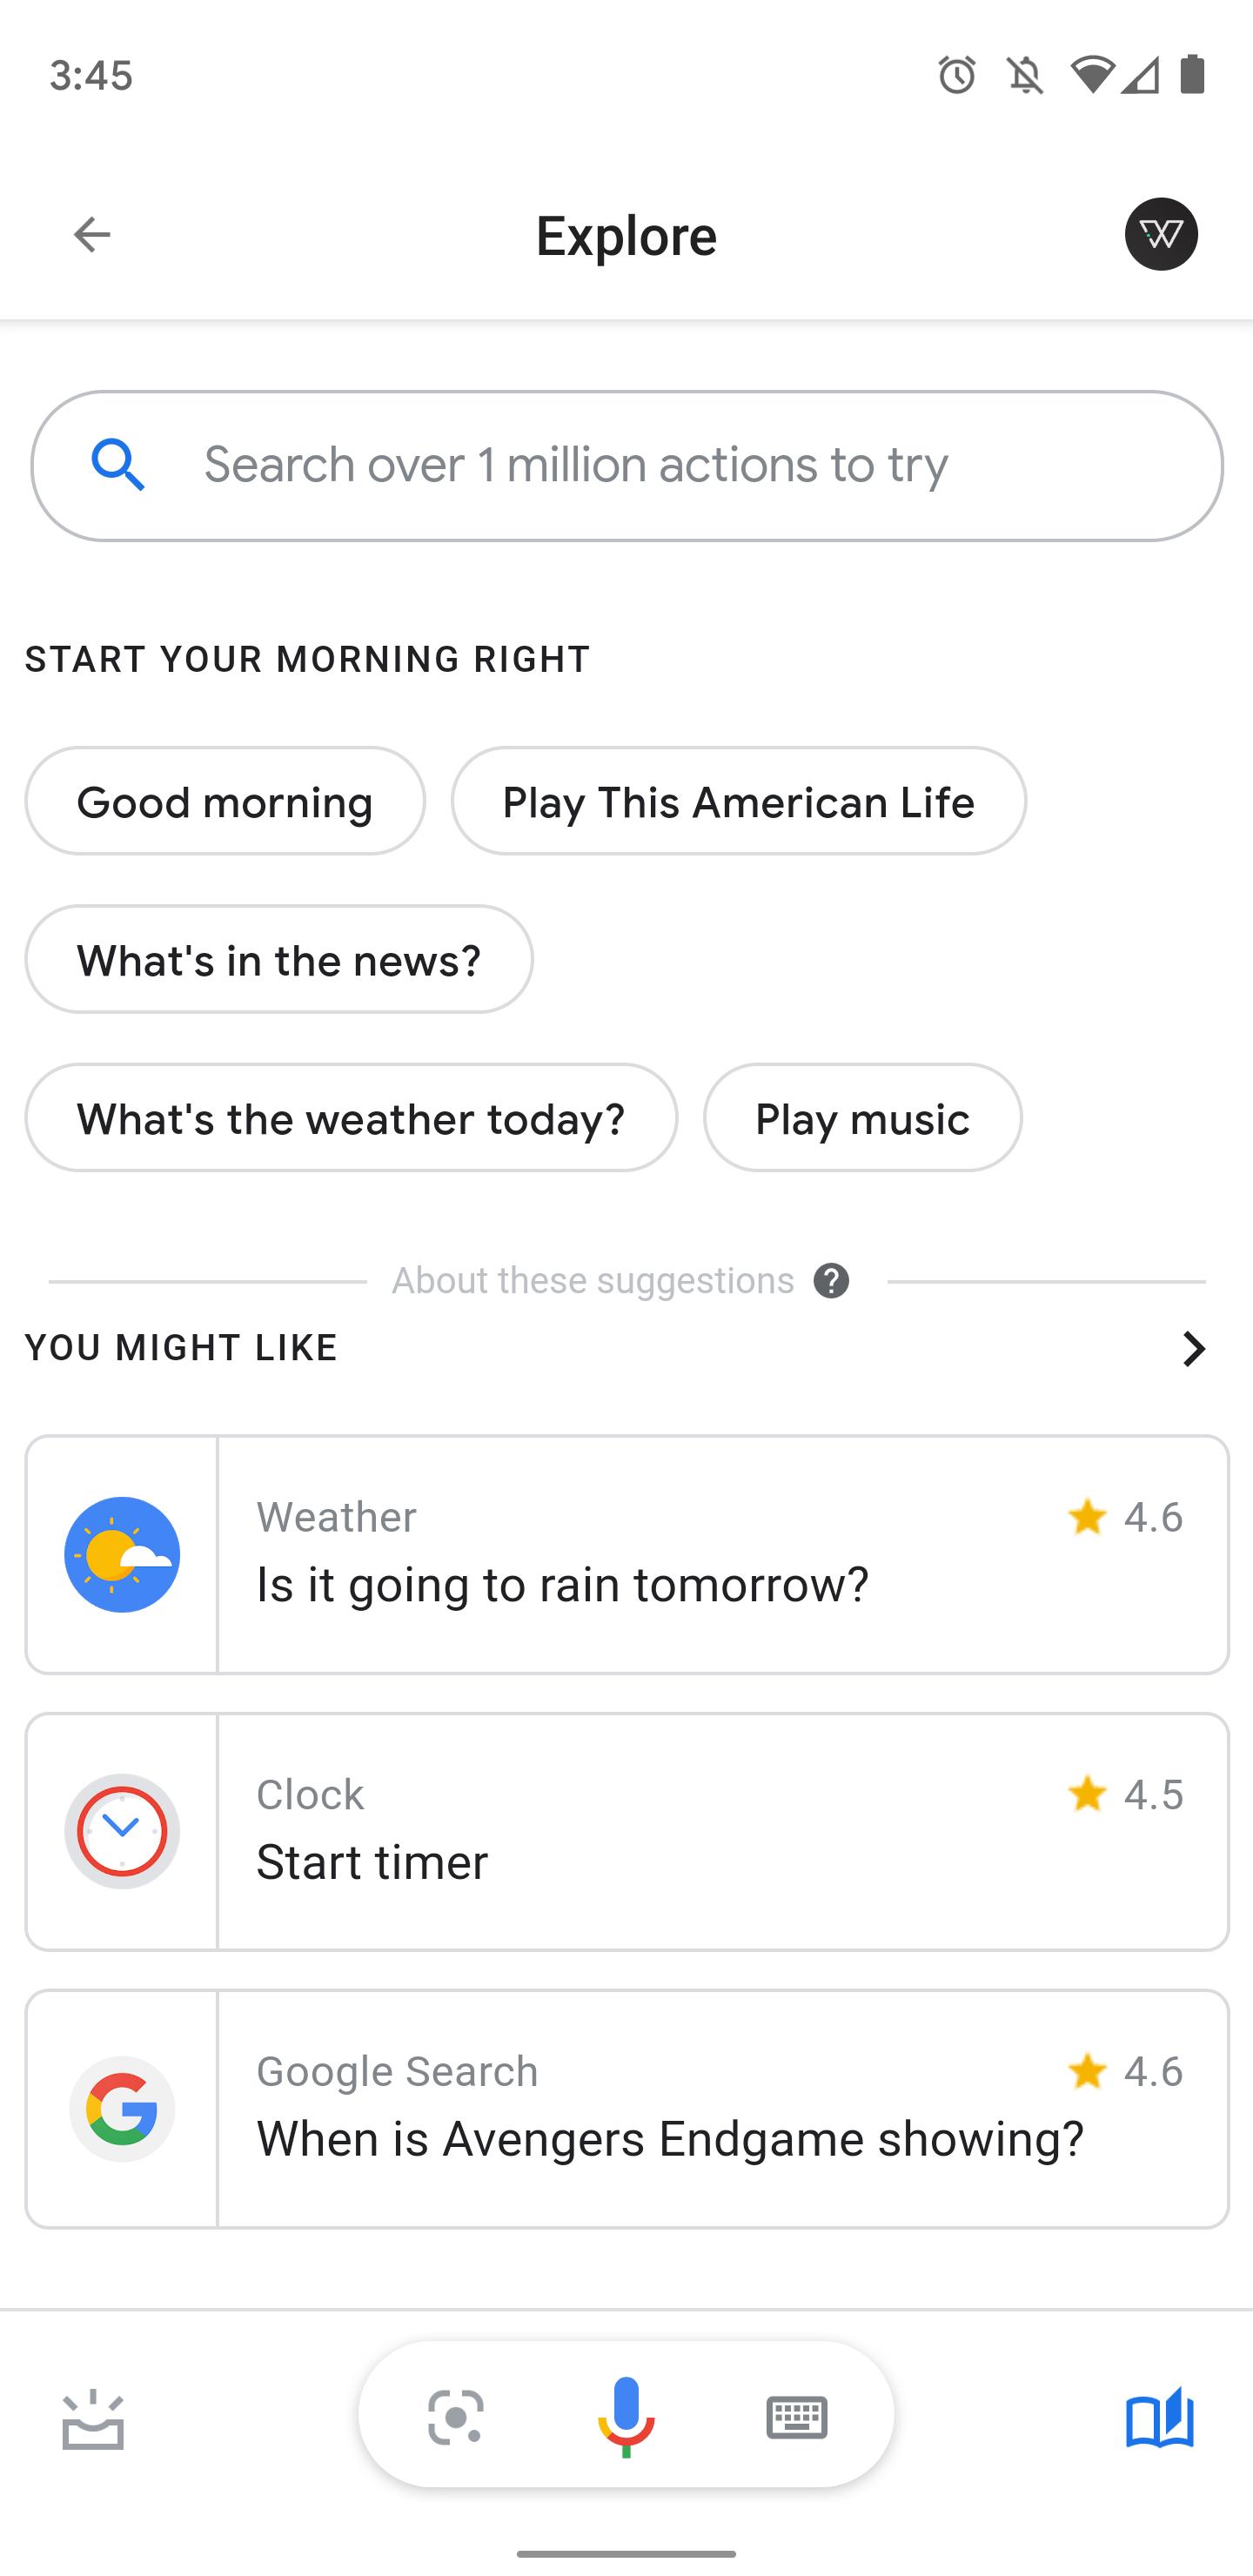 Update: New Explore icon] Google app 10 24 details 'Brief